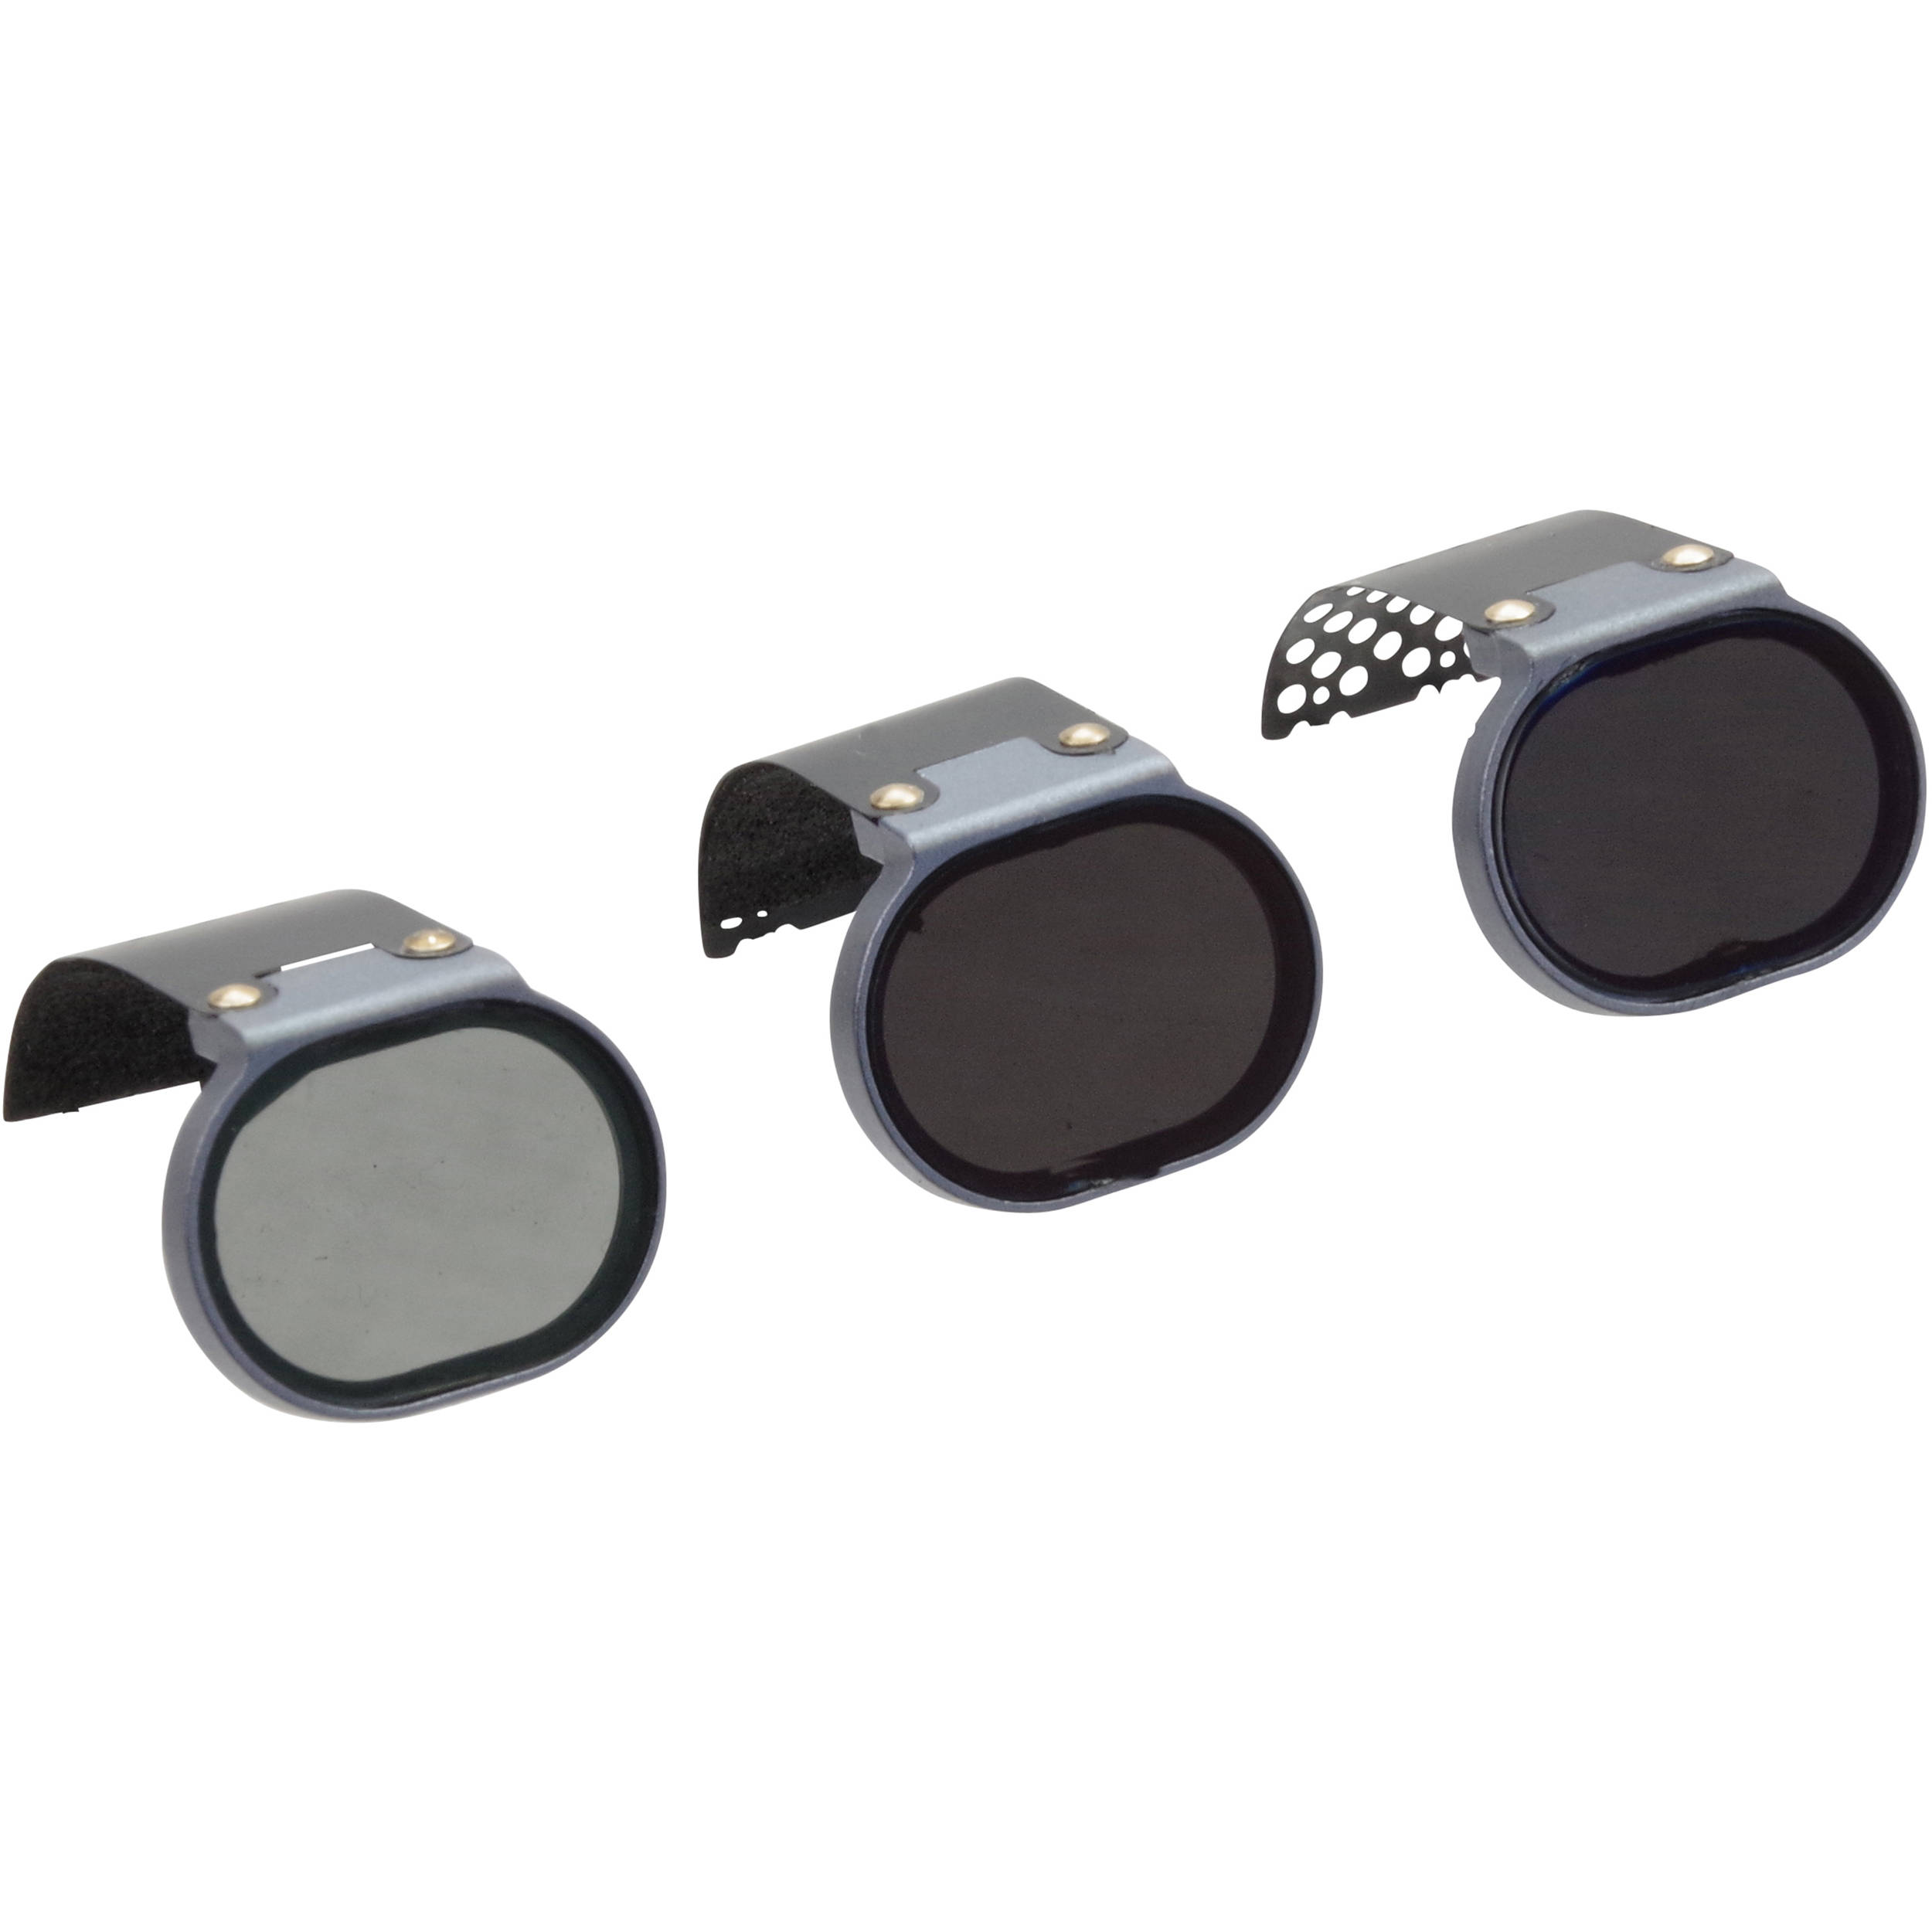 PolarPro Prime Filters 3 Pack For DJI Spark